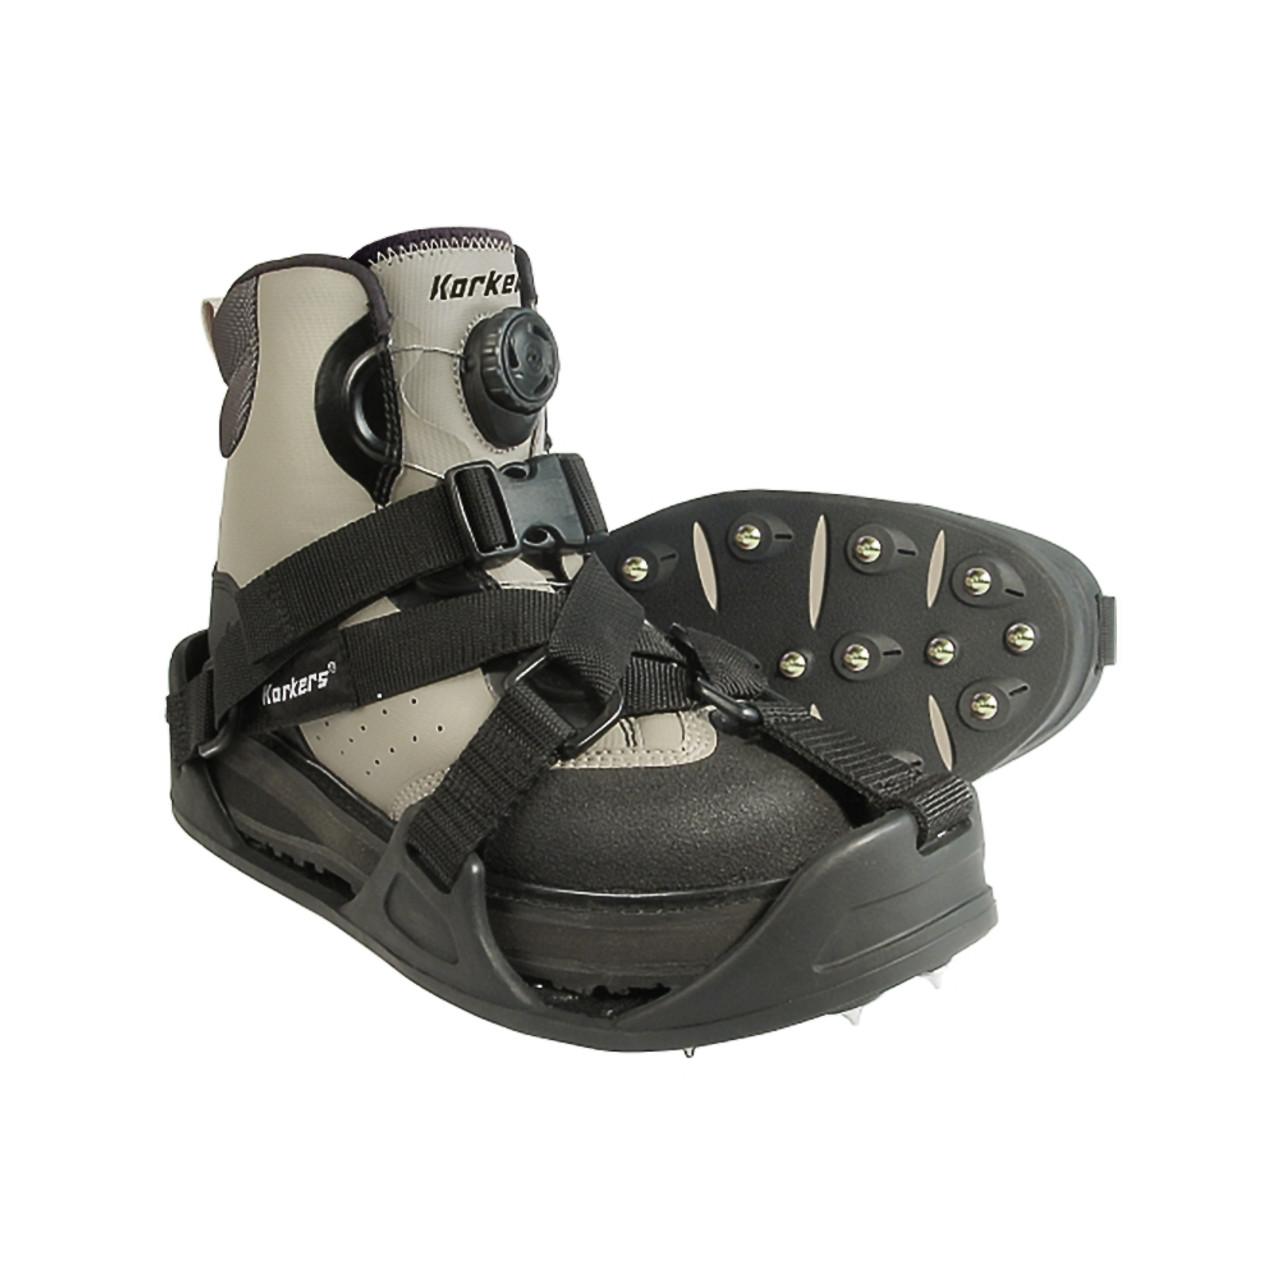 KORKERS RockTrax Plus Fishing Overshoe FA5101 Size Large Black//Moonrock